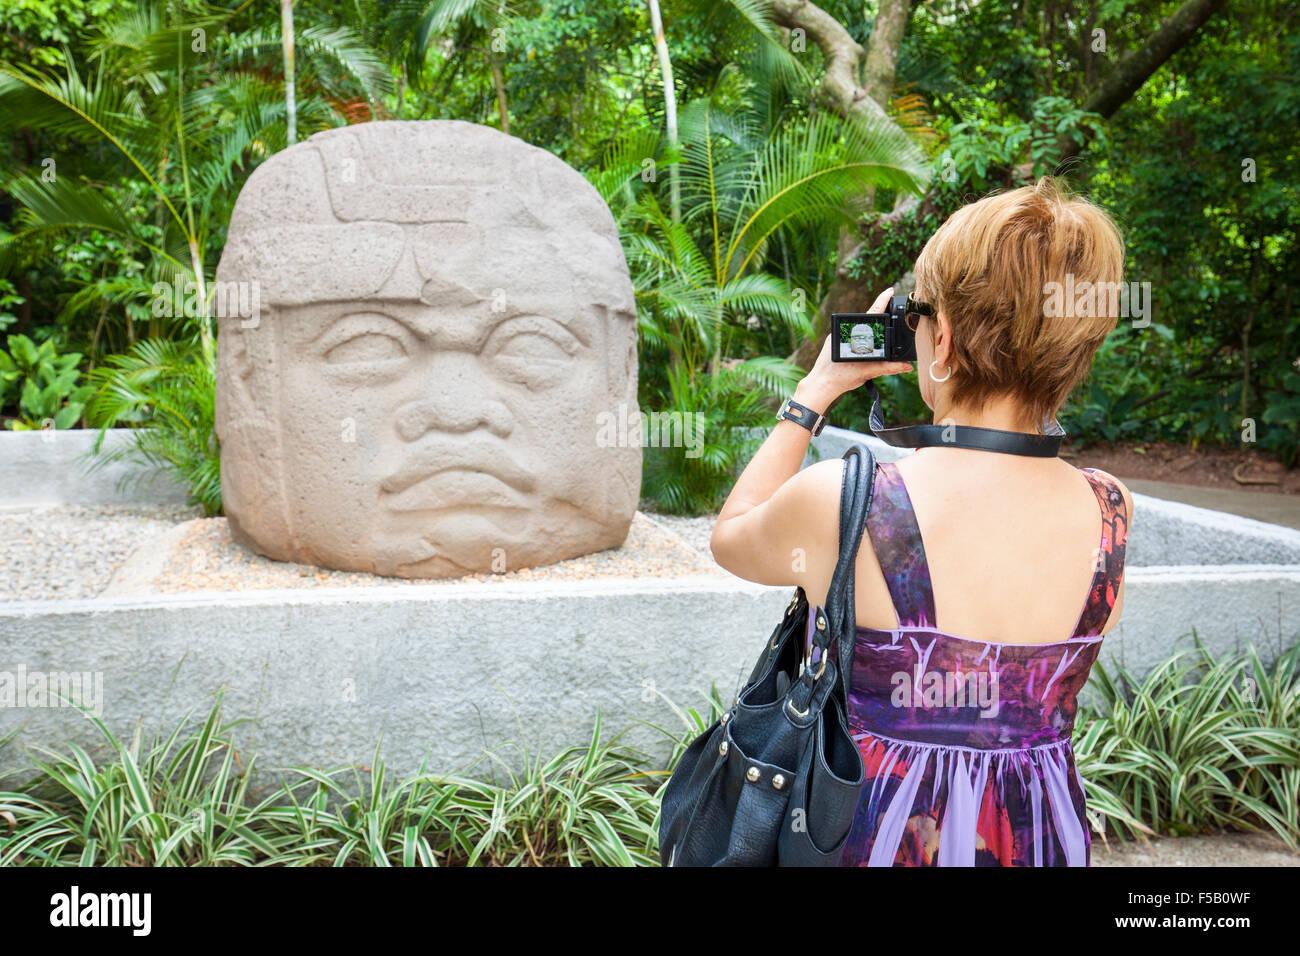 Weibliche Touristen Fotos der olmec Steinbildhauerei kolossalen Kopf in La Venta Park, Villahermosa, Tabasco, Mexiko. Stockbild